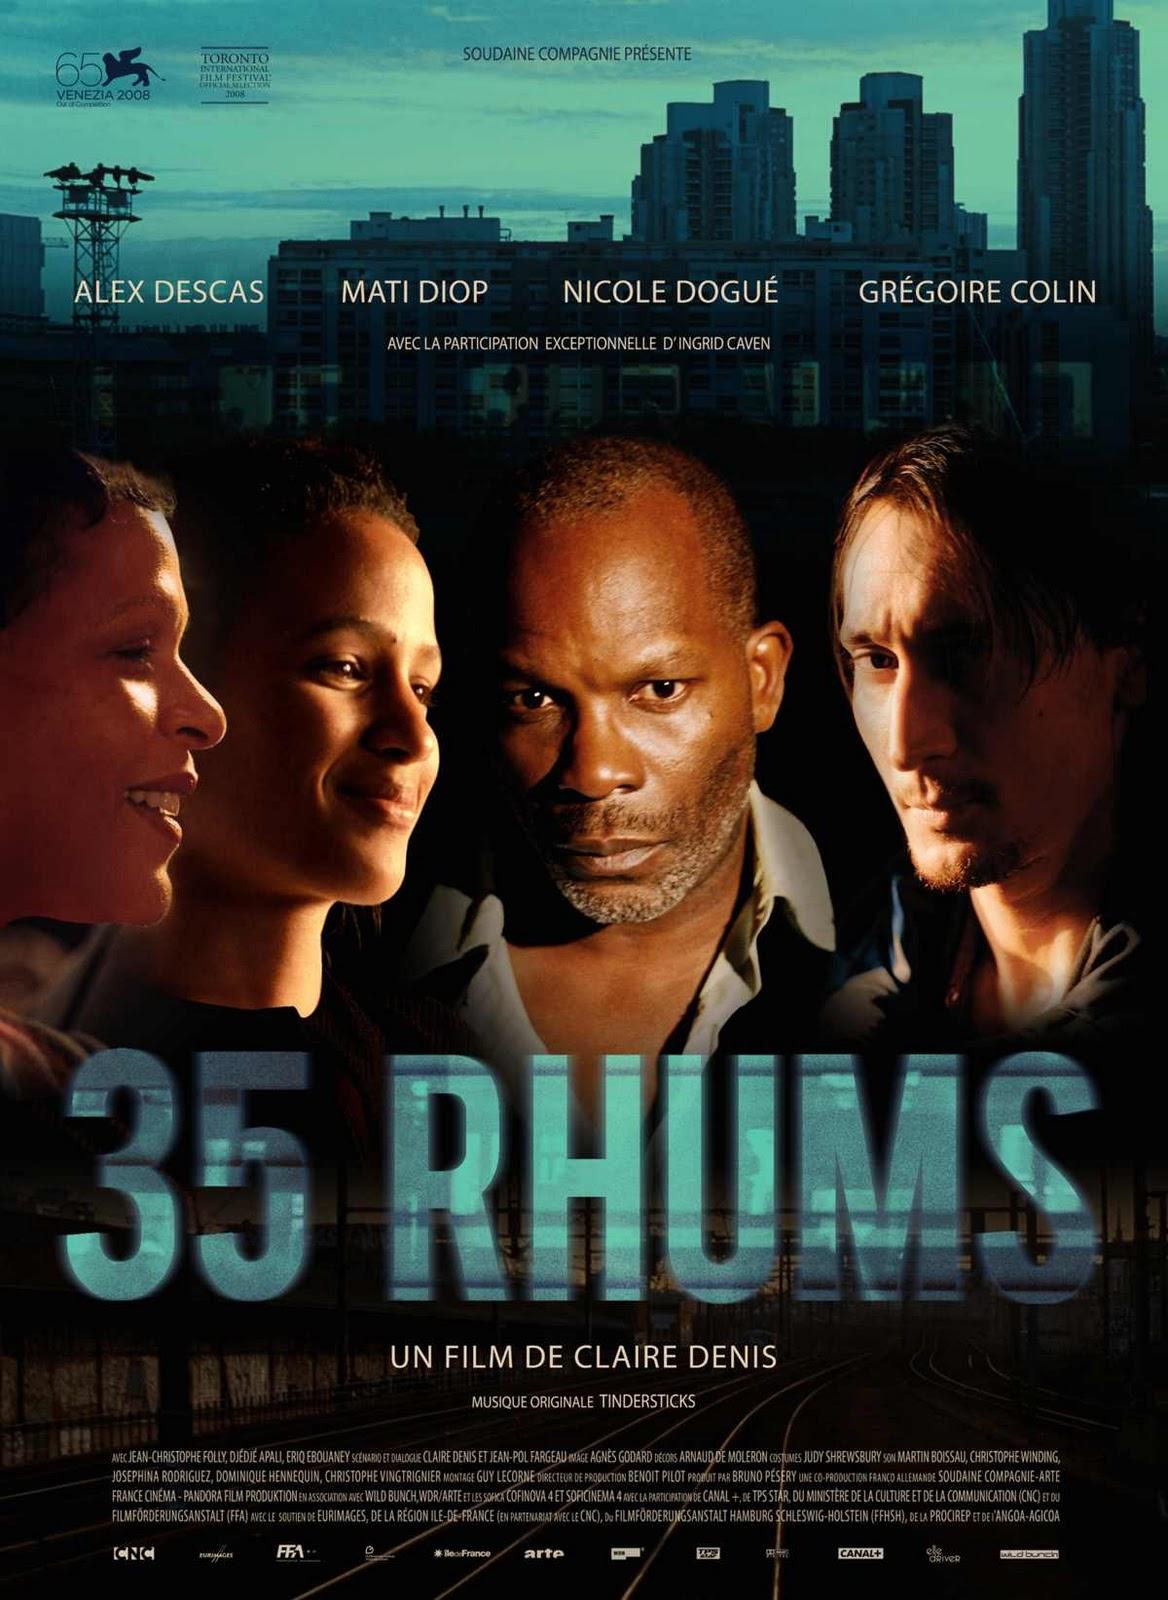 35 shots of rum essay Justwatch.